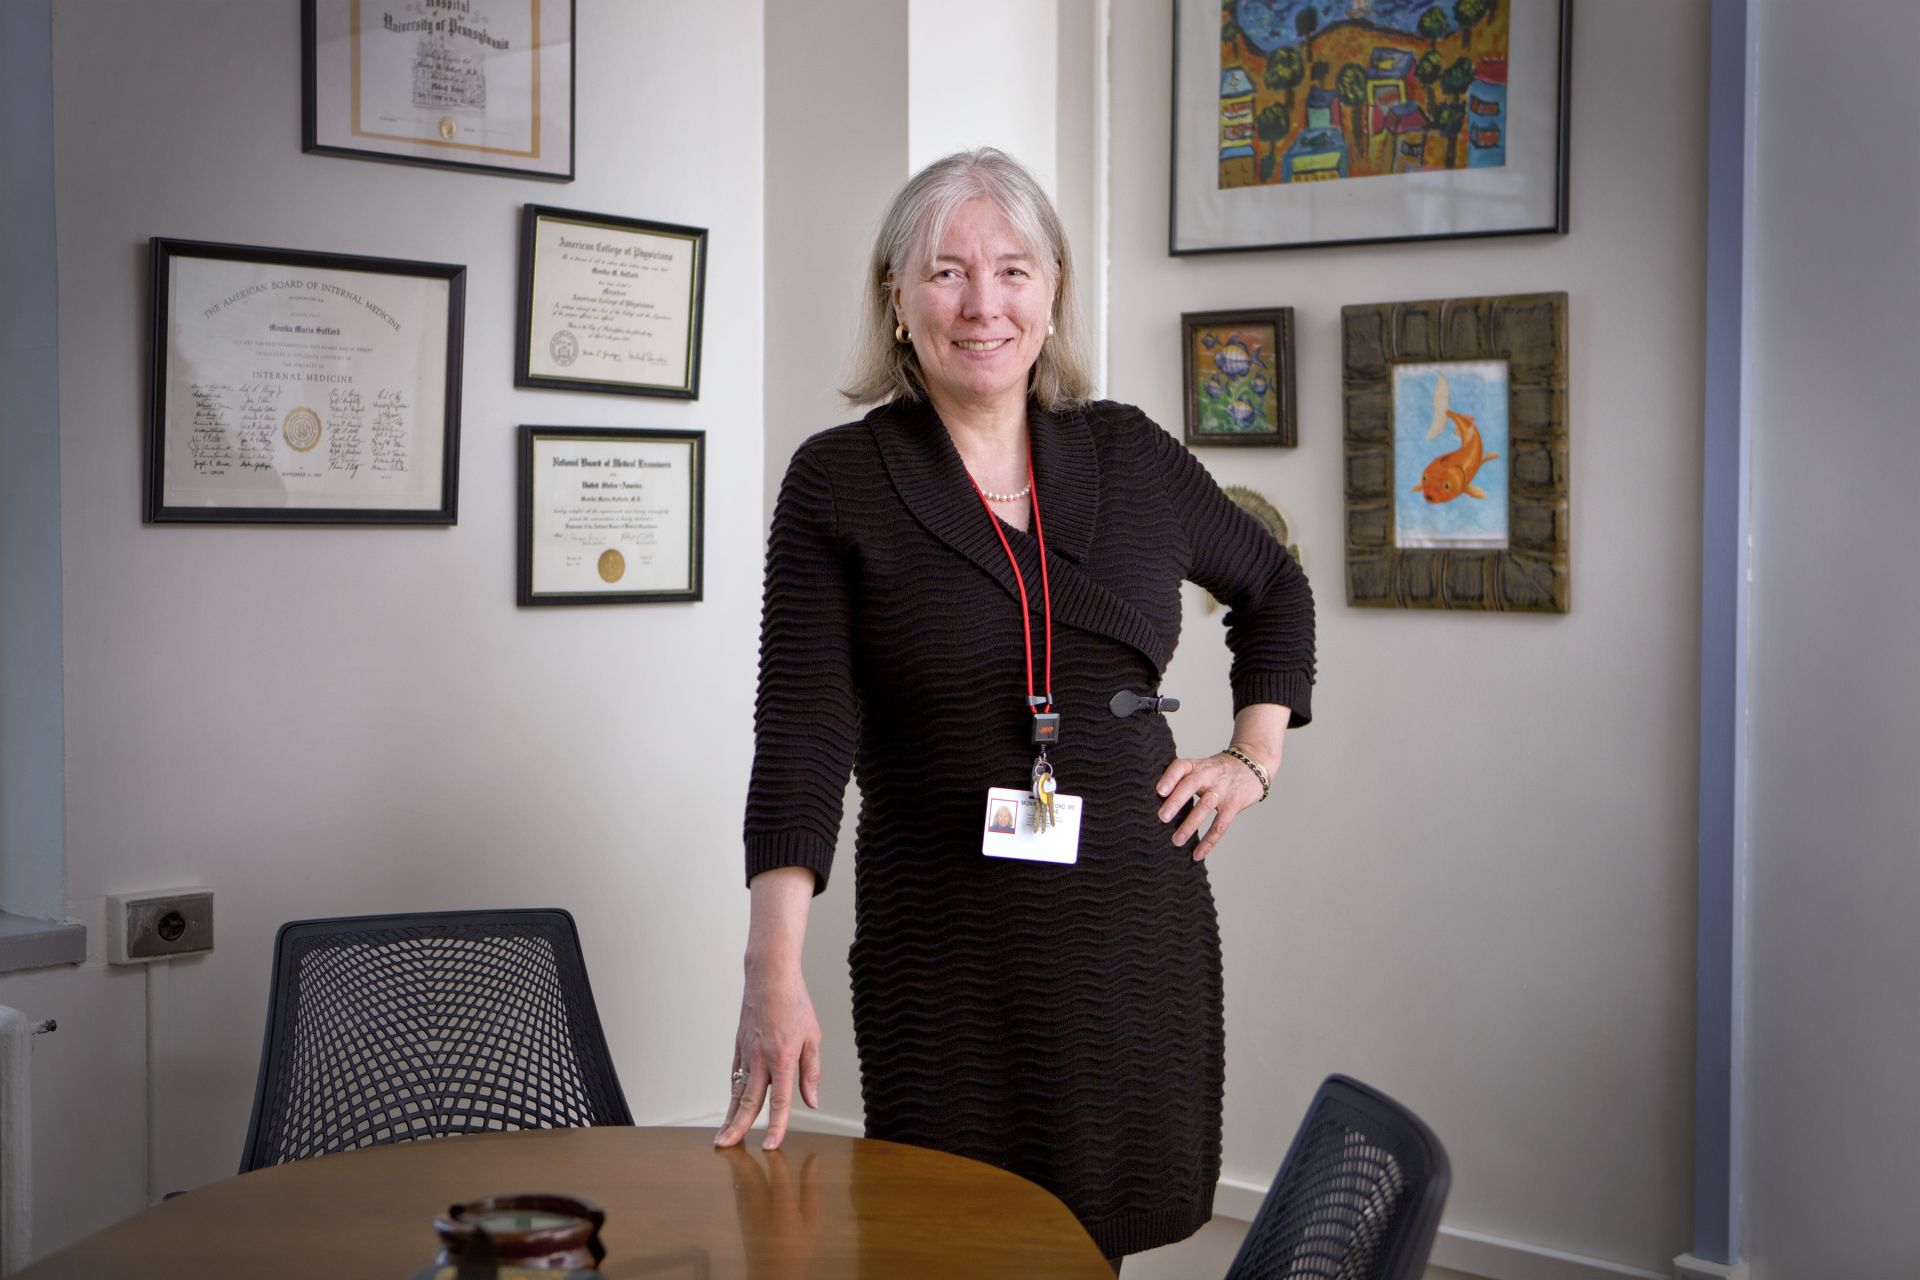 Dr. Monika Safford (photo by John Abbott/Weill Cornell Medicine)